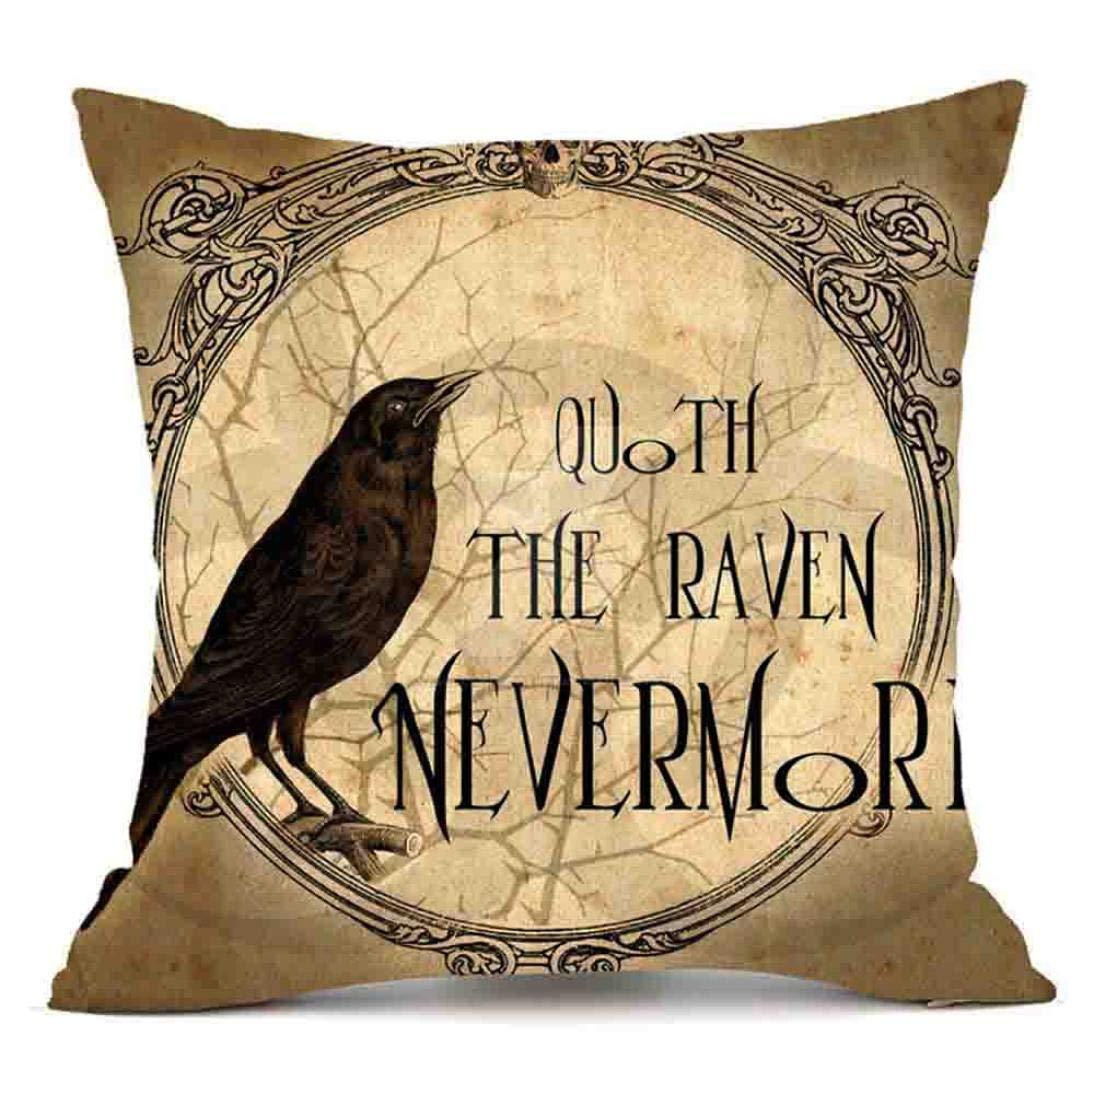 Zainafacai Happy Halloween - Sofa Waist Throw Cushion Cover Pillow Cases Linen- Home Décor (Khaki, One Size)